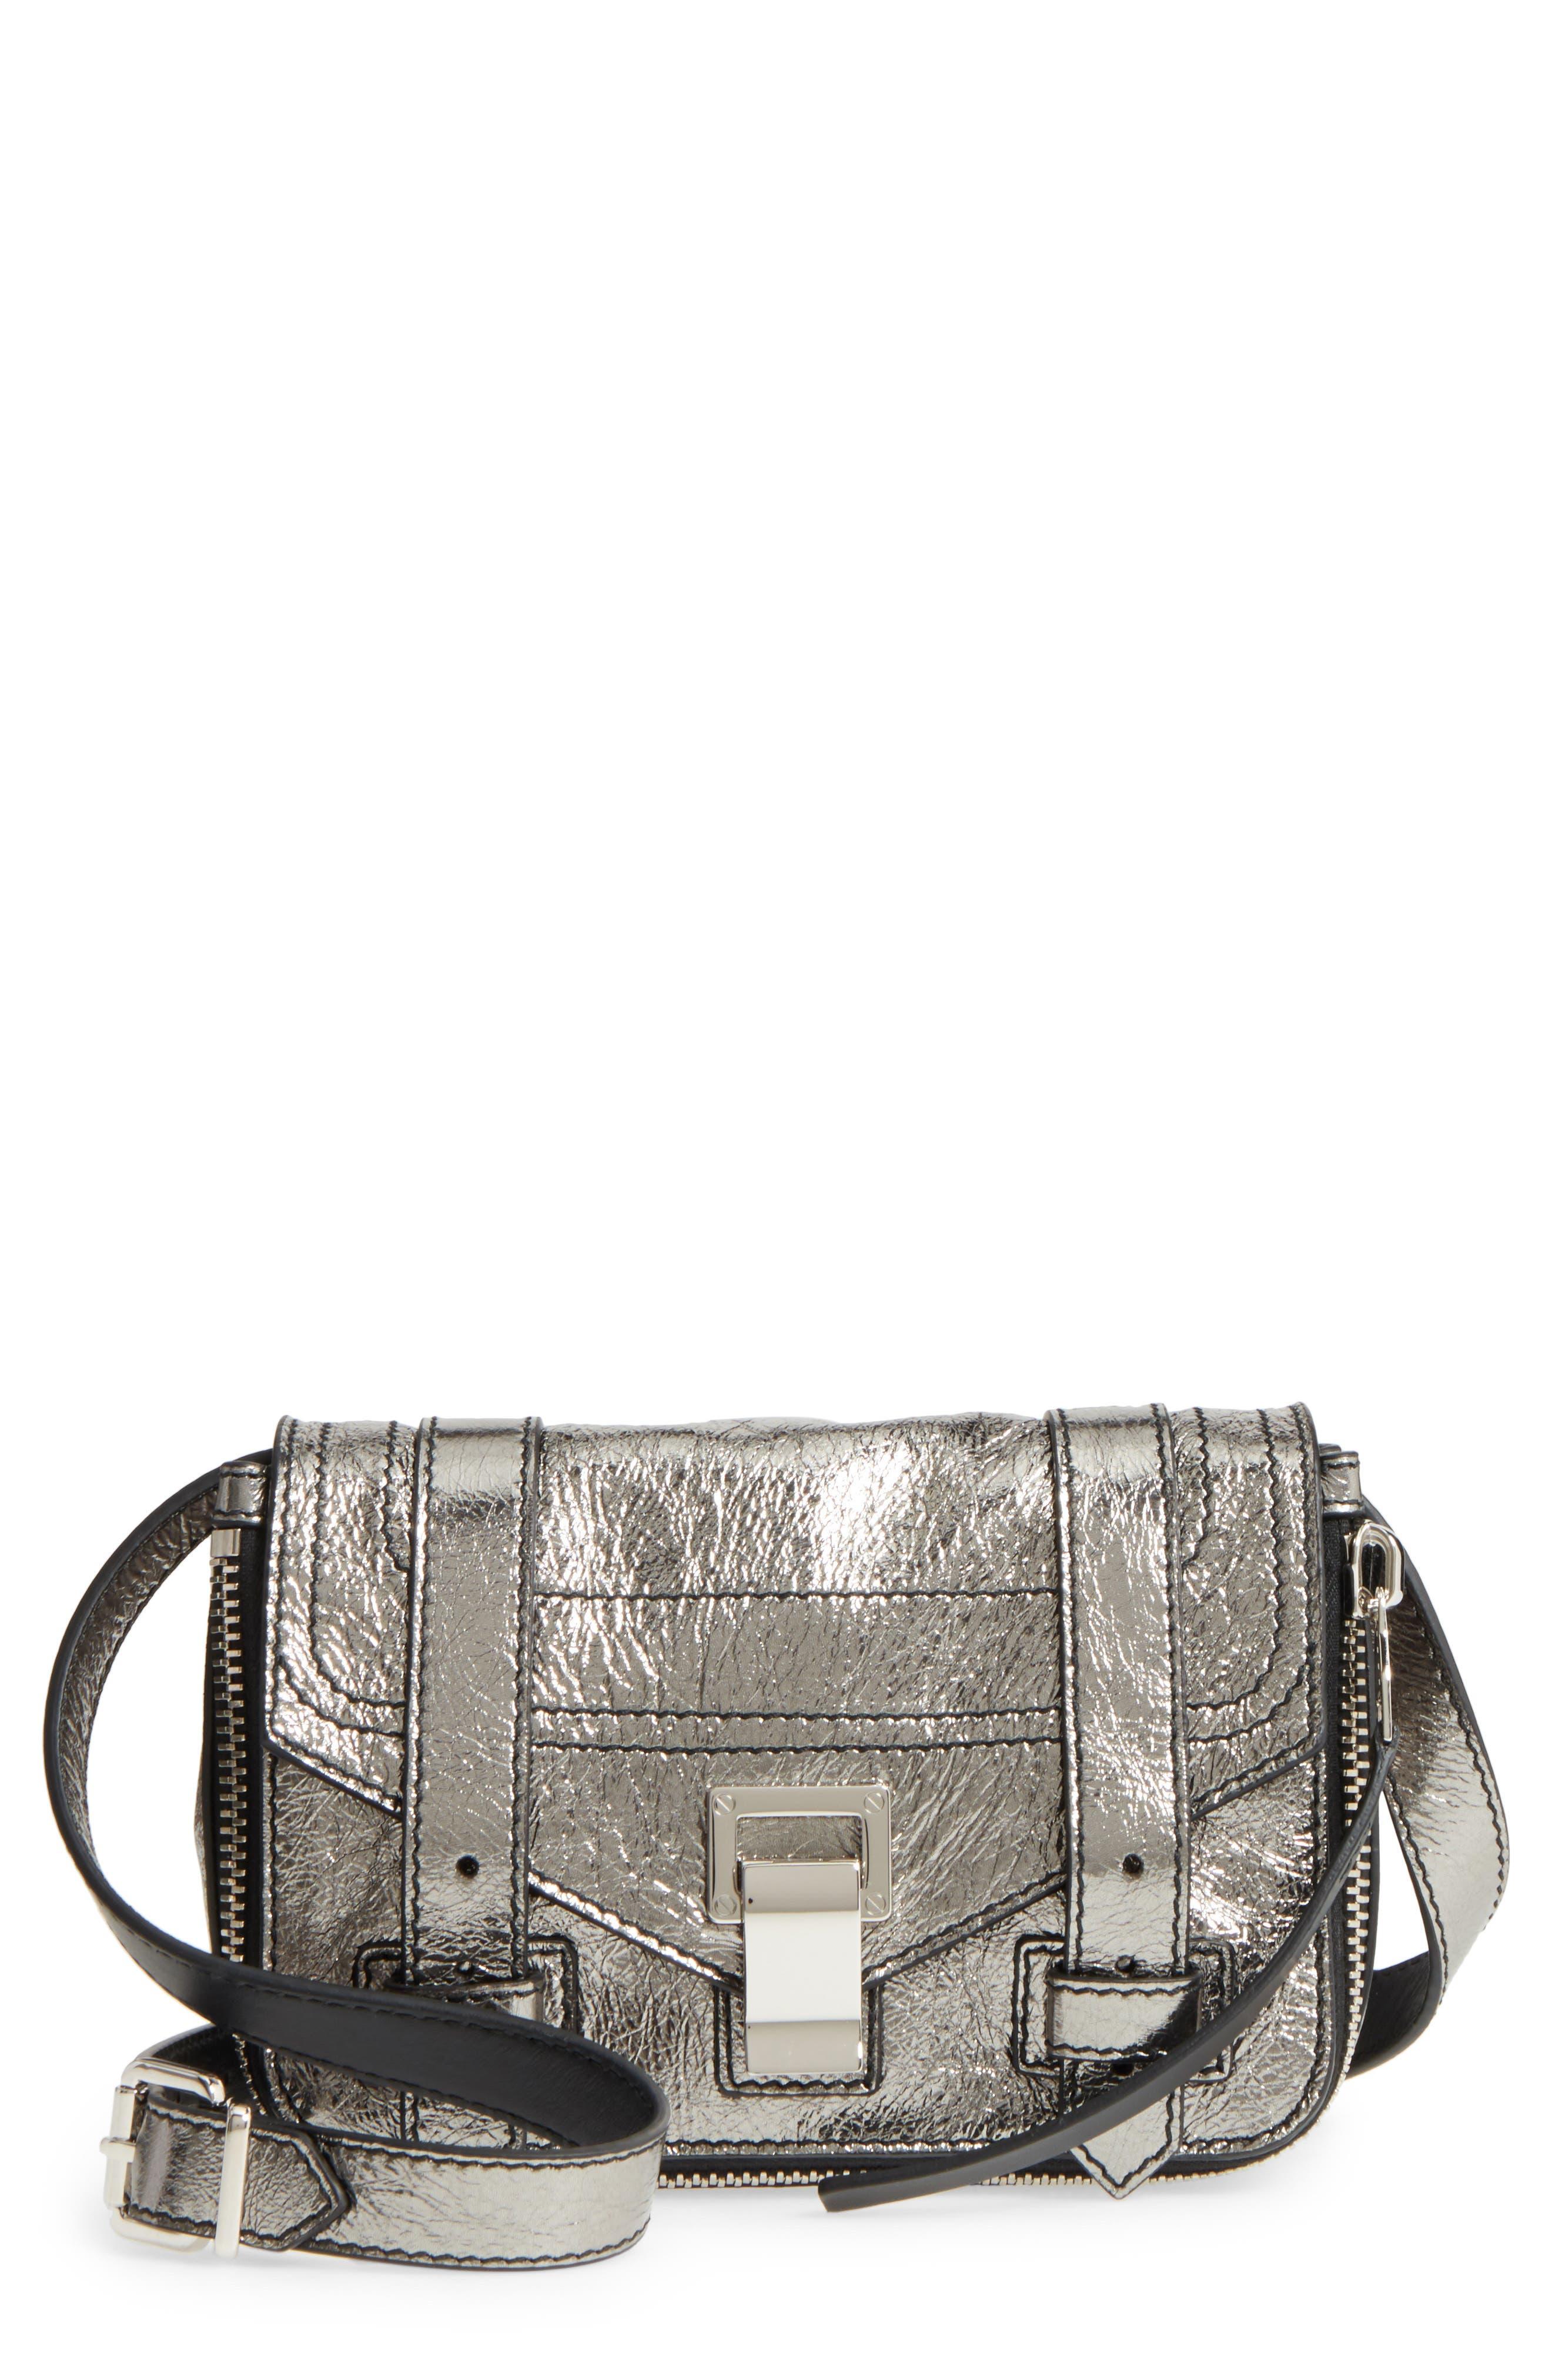 Mini PS1 Metallic Leather Crossbody Bag,                             Main thumbnail 1, color,                             Dark Silver